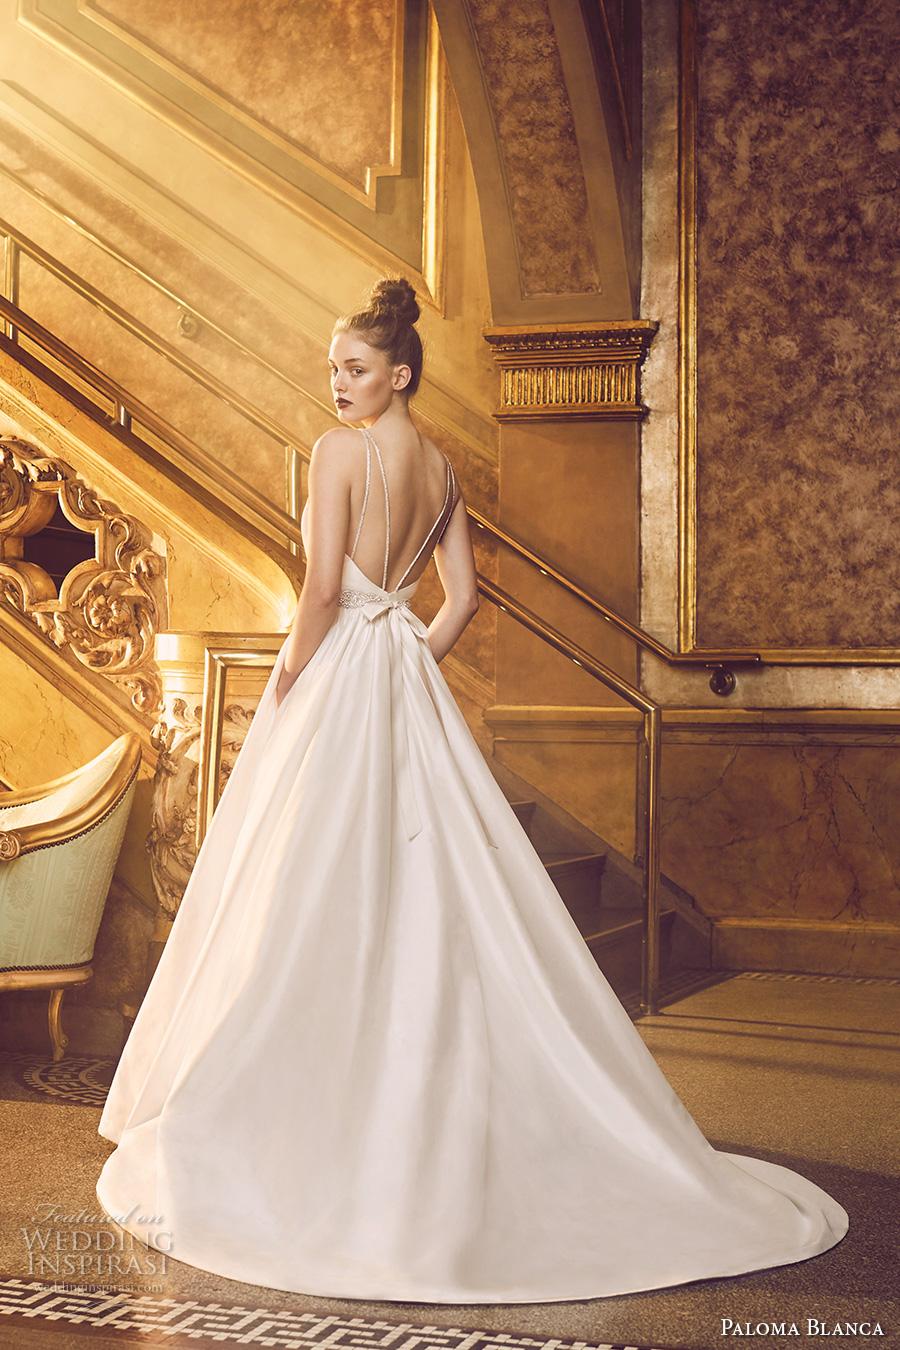 Paloma Blanca Wedding Dresses For Sale 5 Lovely paloma blanca fall bridal